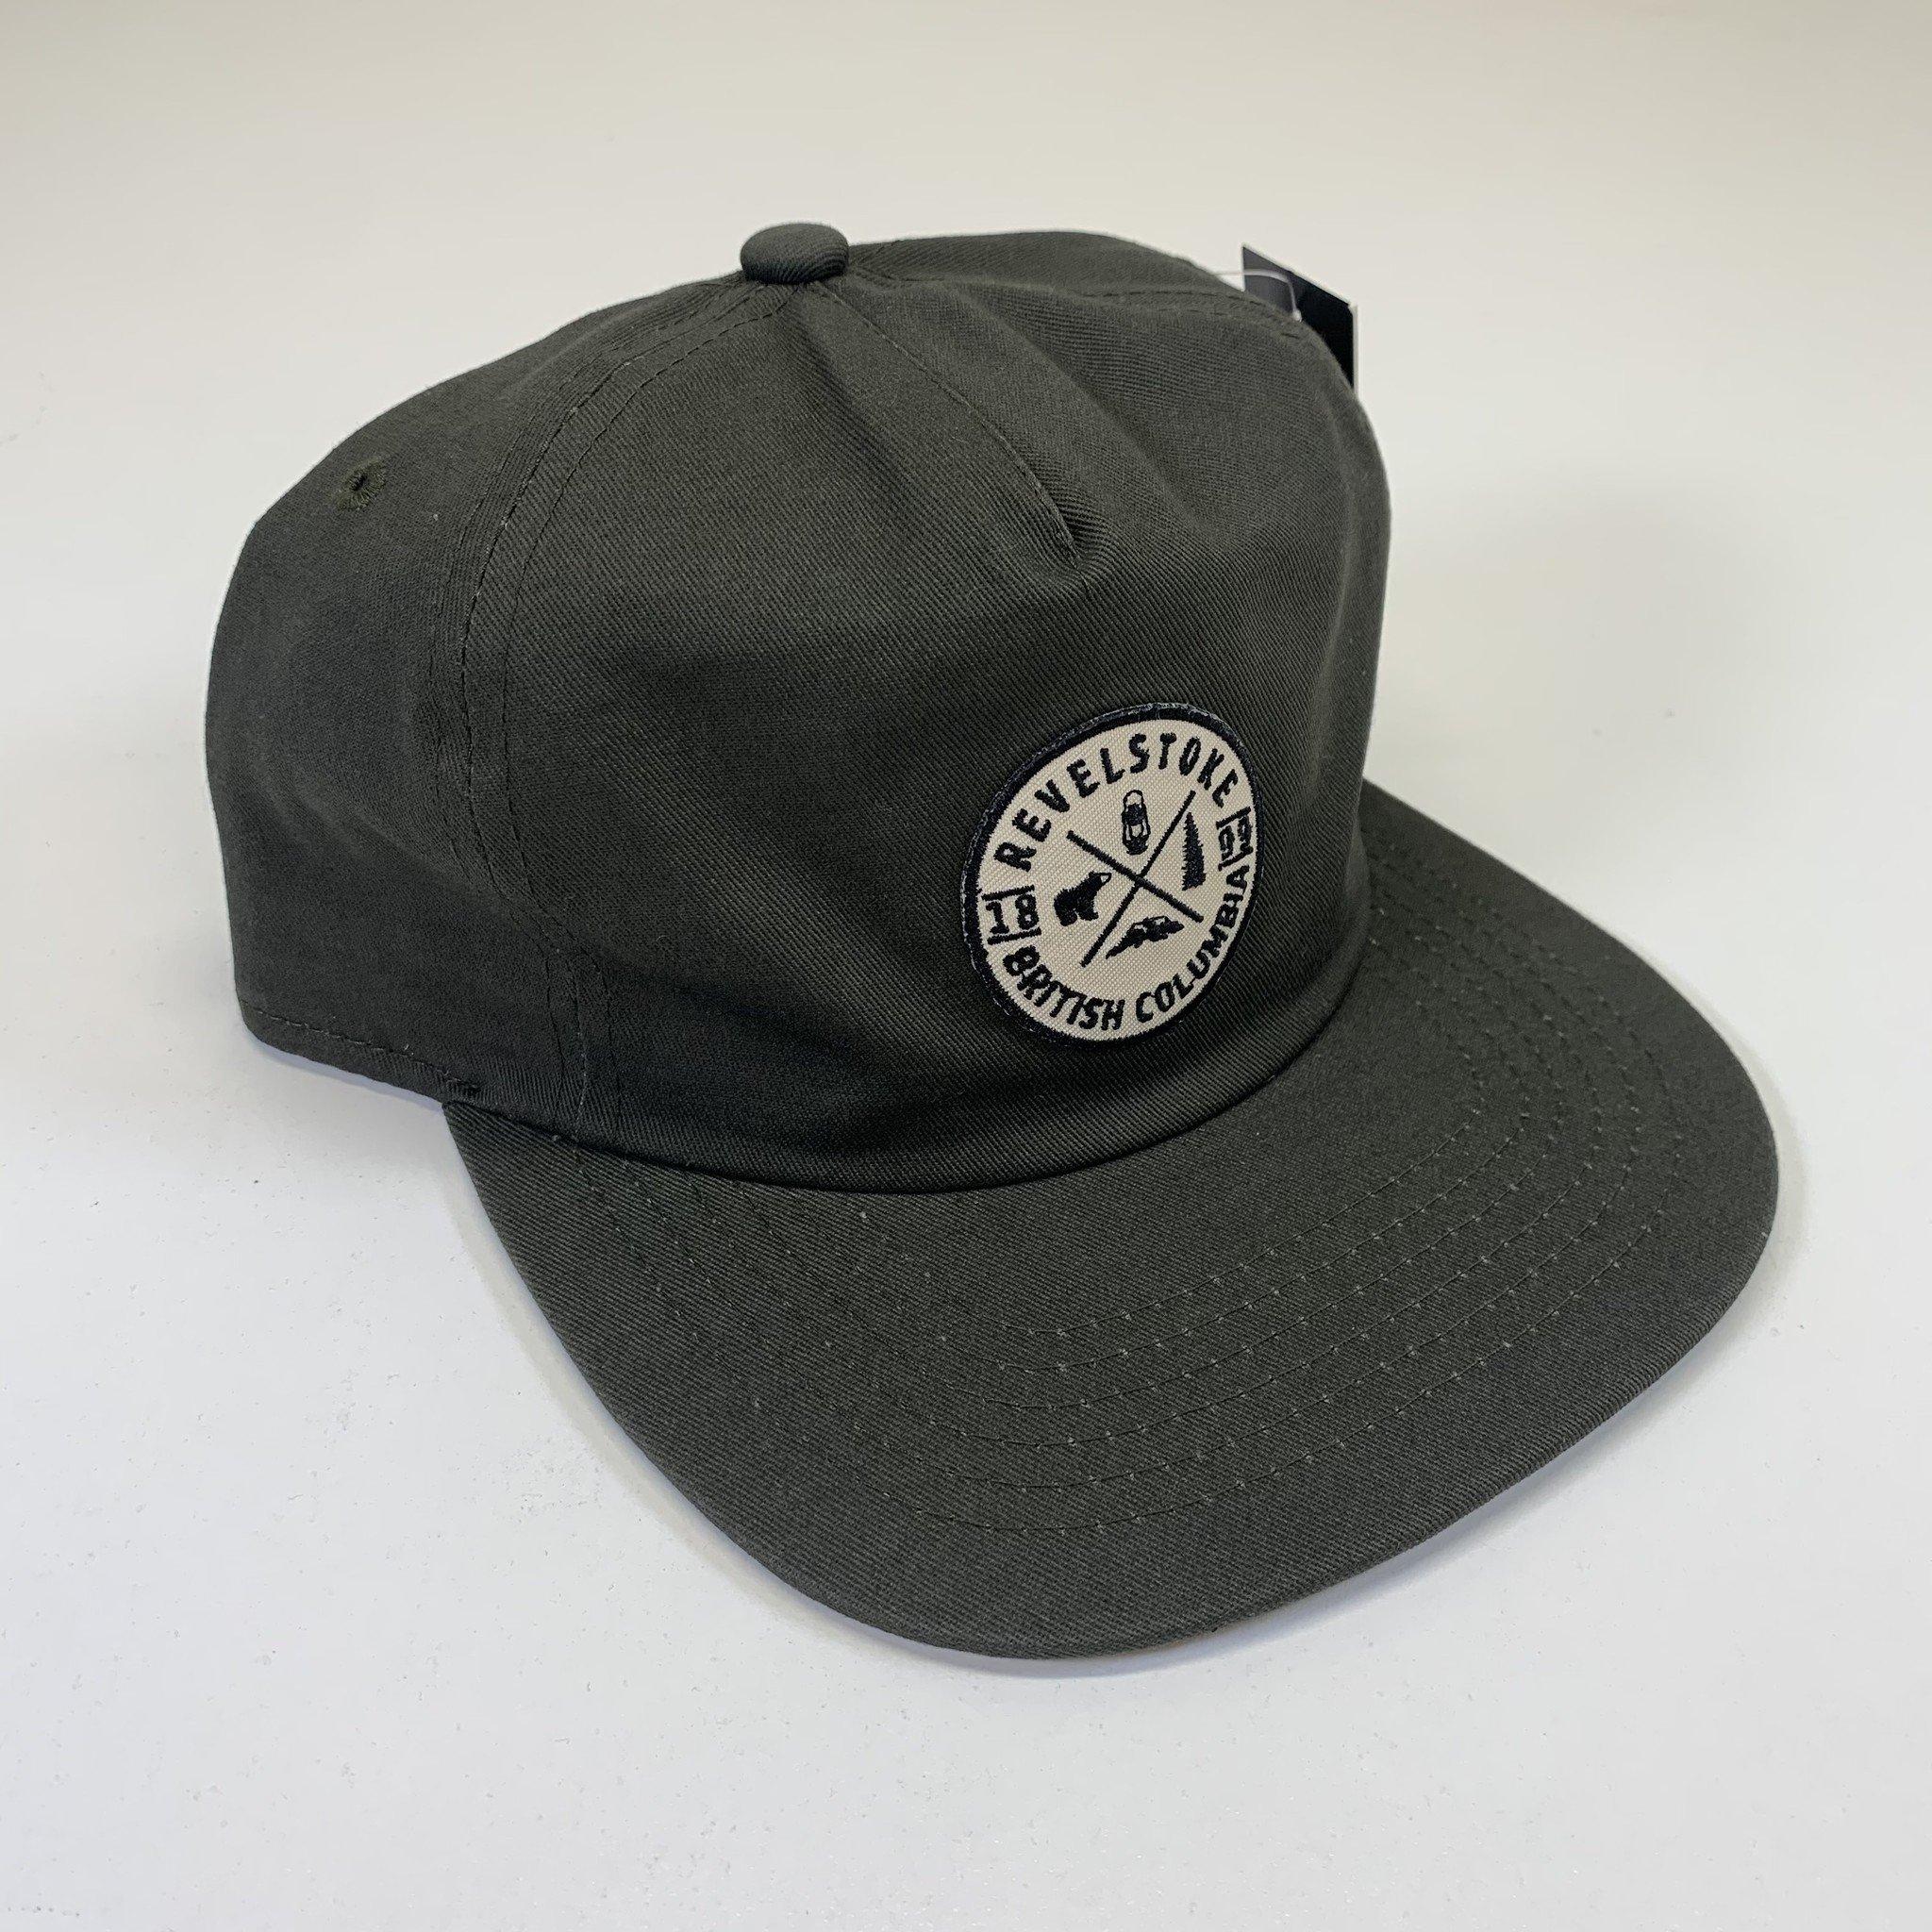 Revelstoke Trading Post Revelstoke - 1899 Patch Cap (Olive)